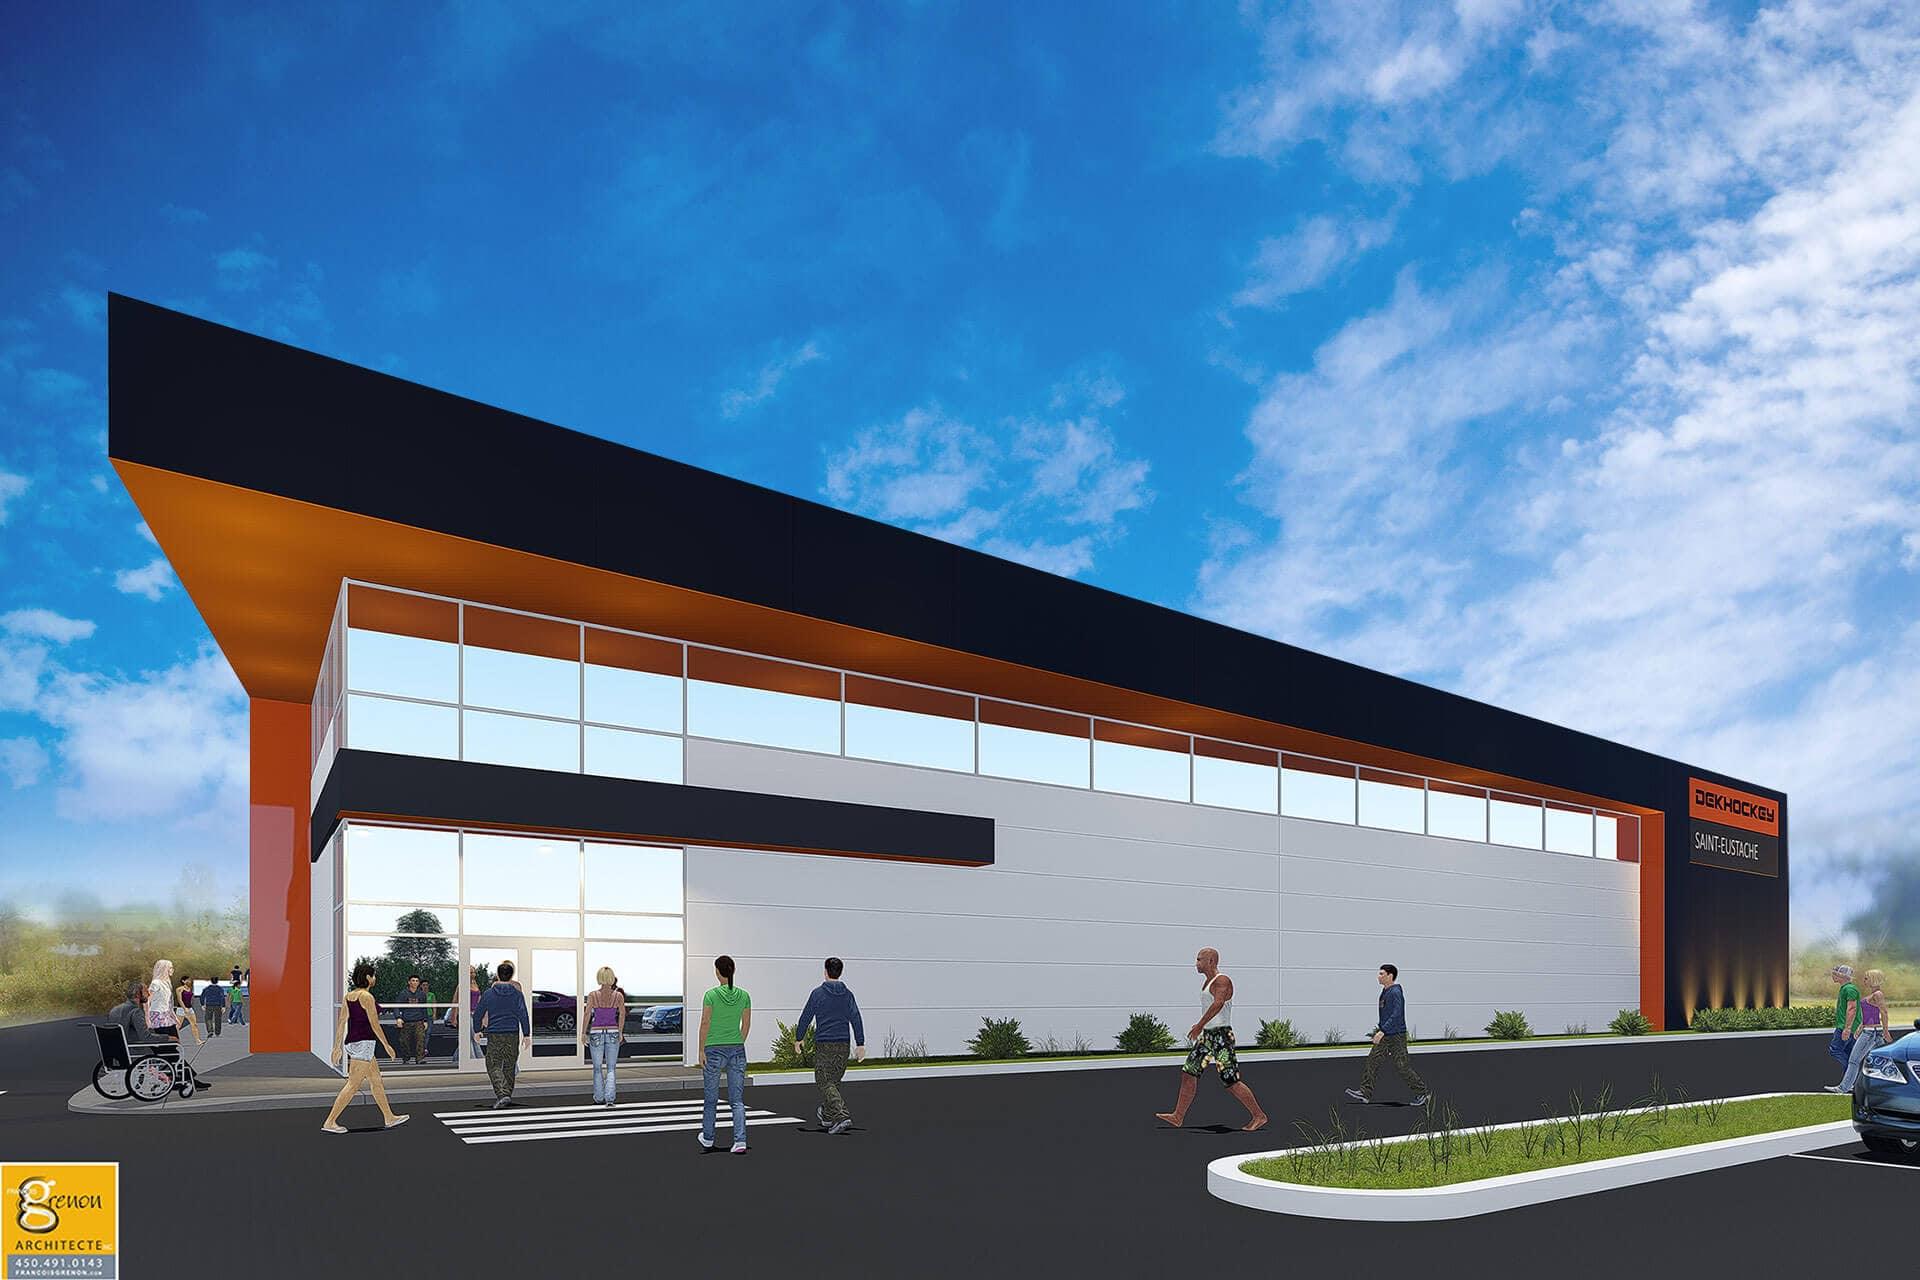 Syscomax_DekHockey_St-Eustache_Sportif_Sports-Building